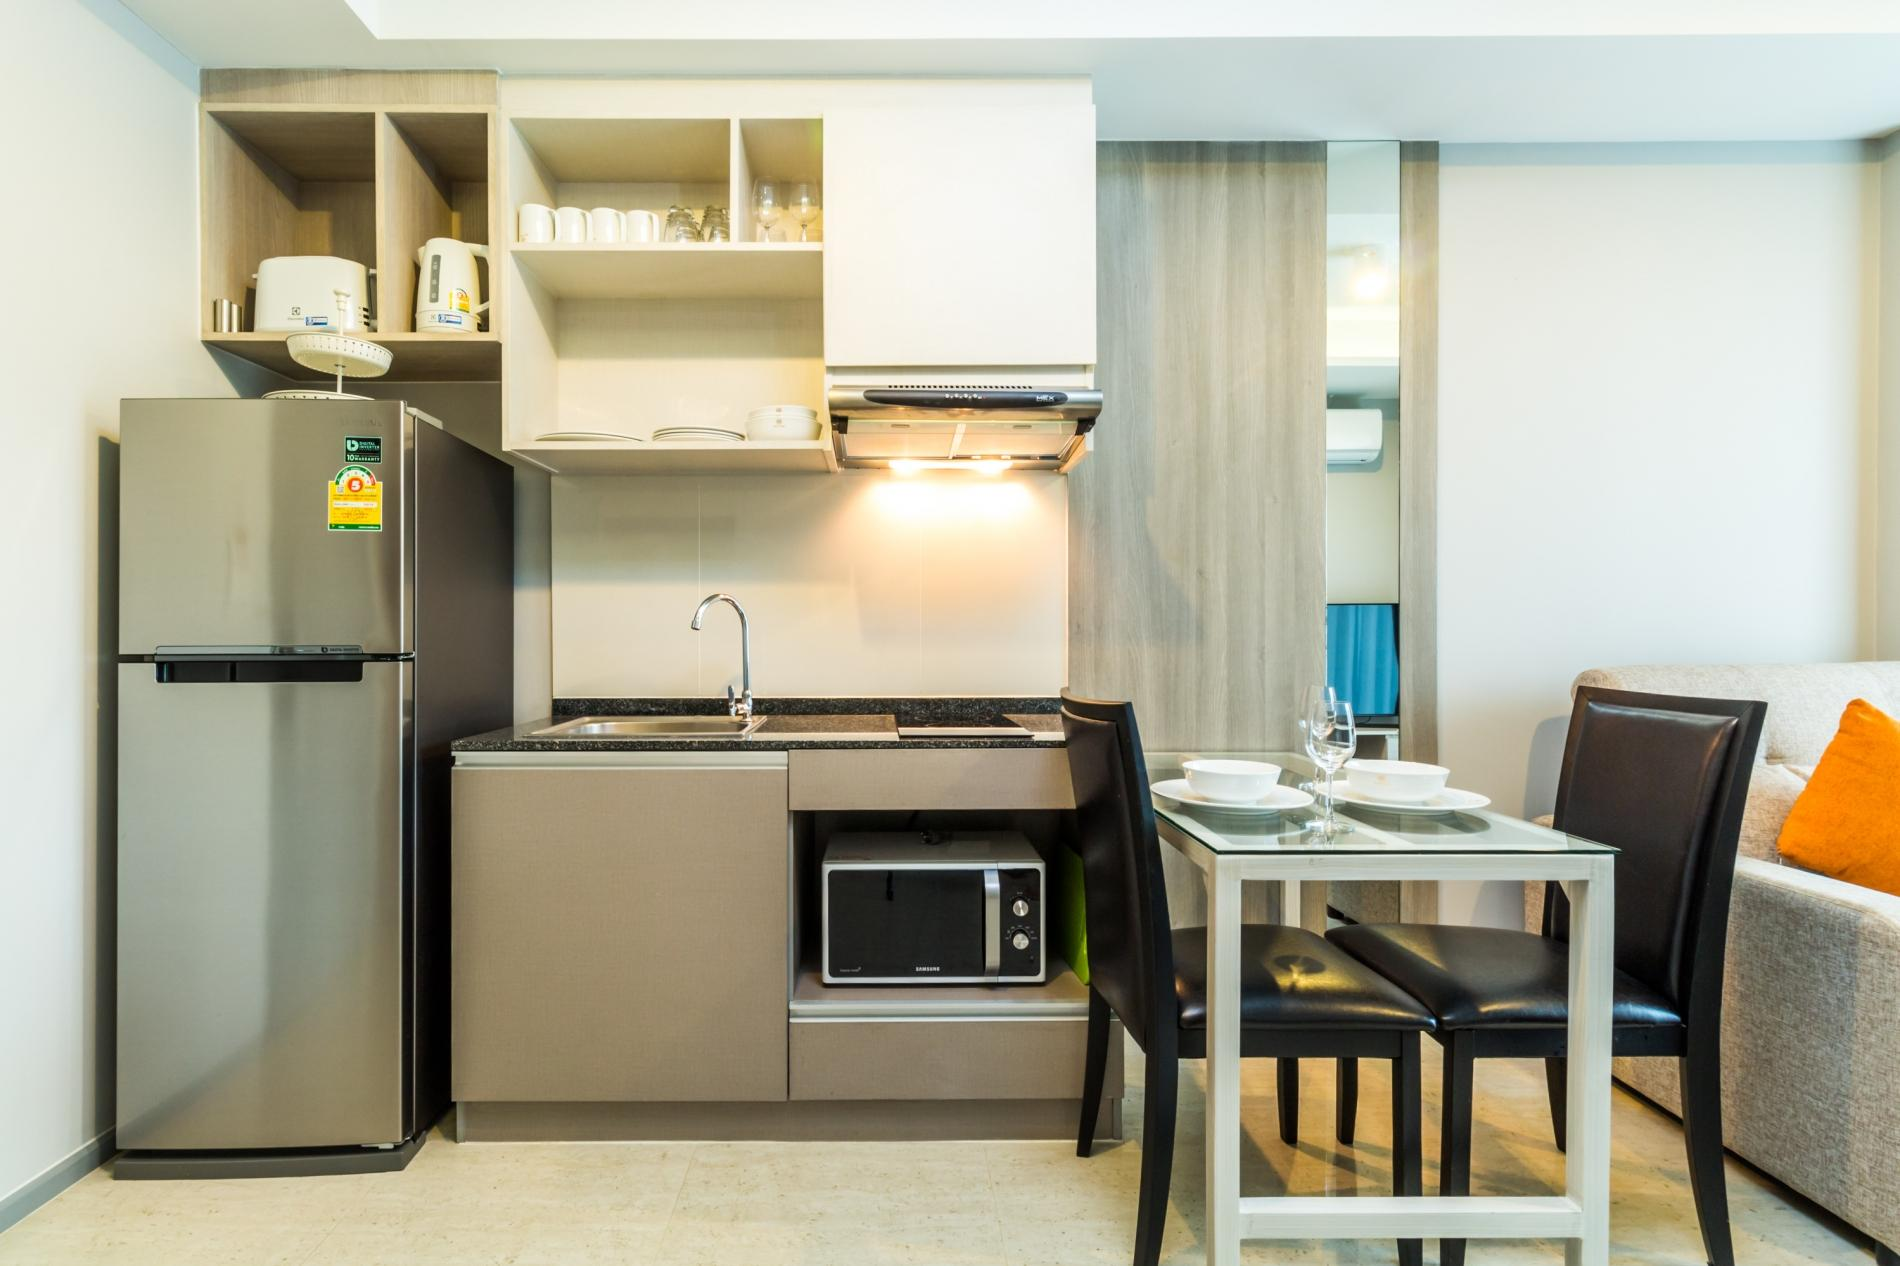 Apartment 6Av 707 - Convenient Surin beach condo with pool and gym photo 18670365